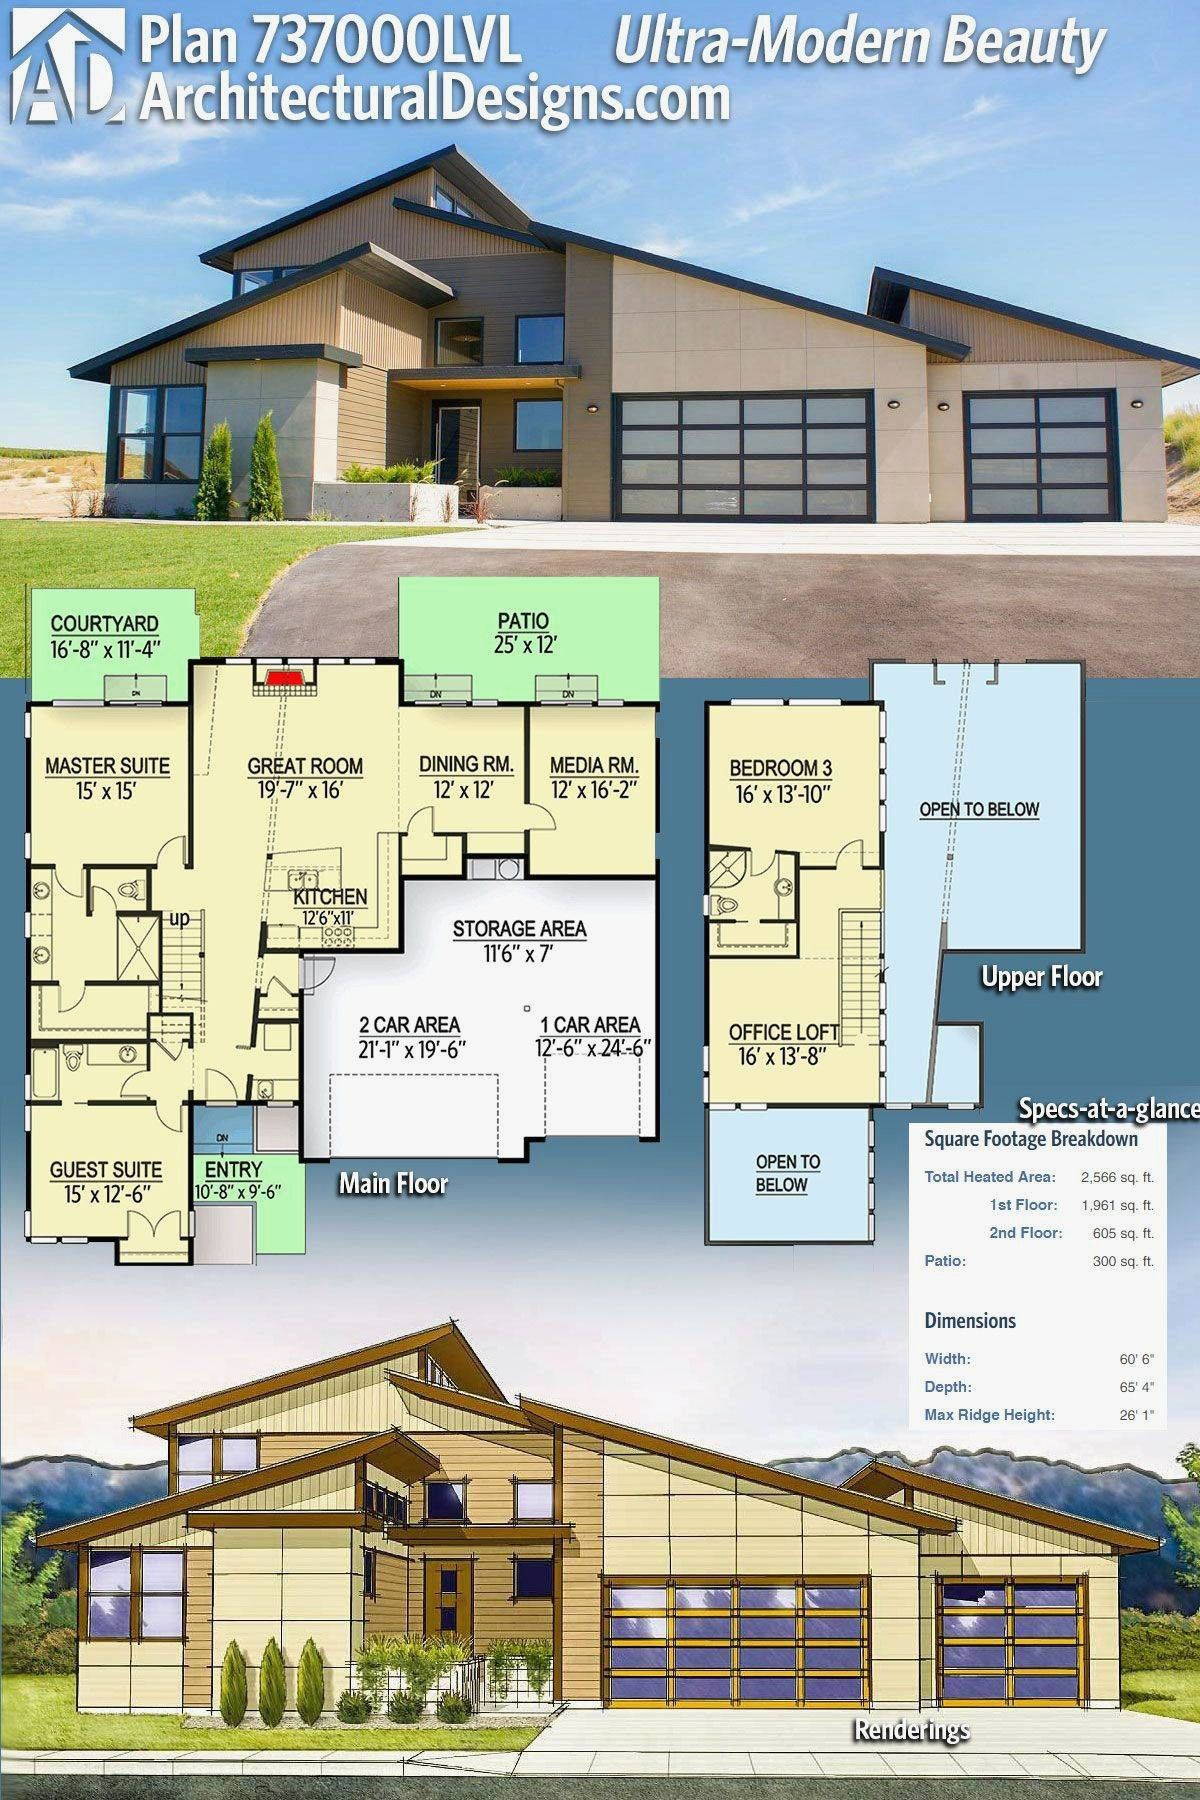 Ultra Contemporary House Plans 2020 Di 2021 Denah Rumah Modern Arsitektur Rumah Modern